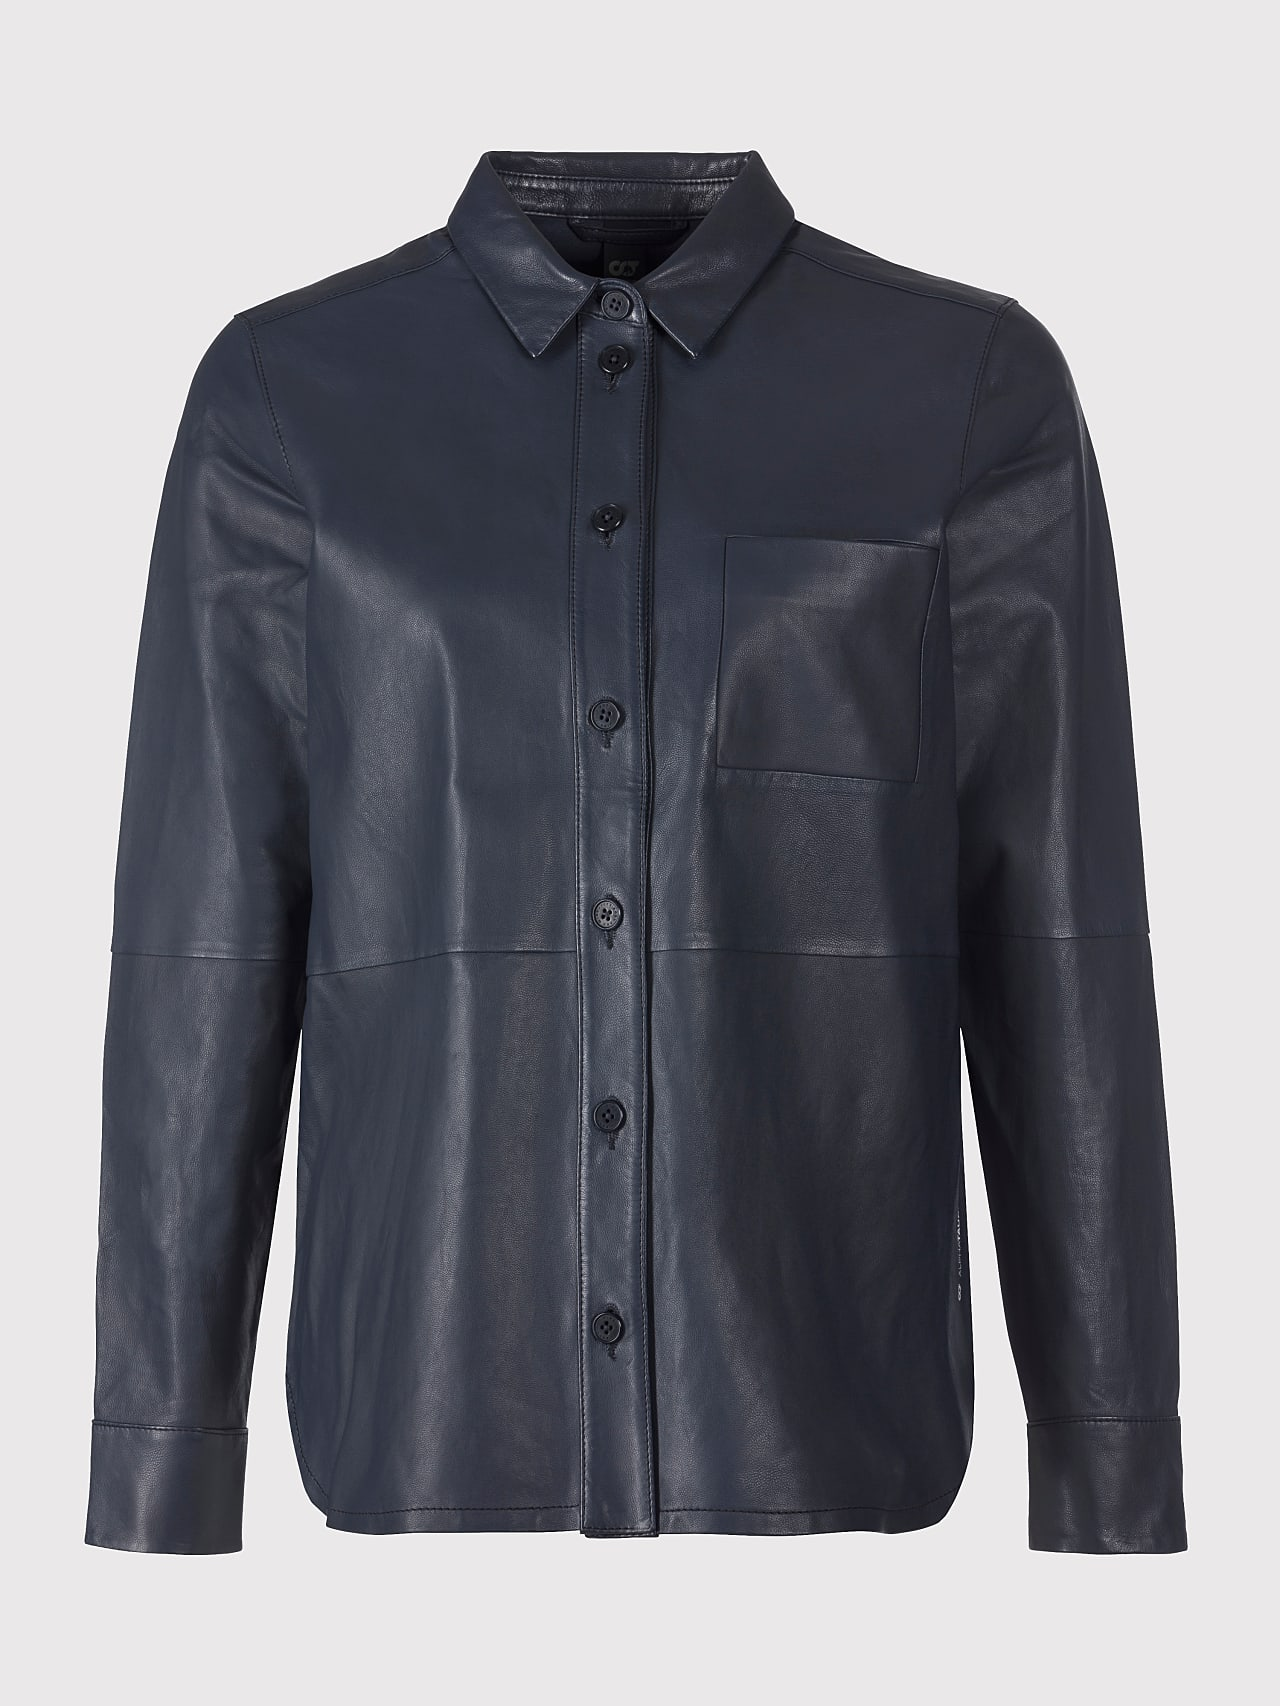 LEORD V1.Y5.01 Leather Shirt navy Back Alpha Tauri